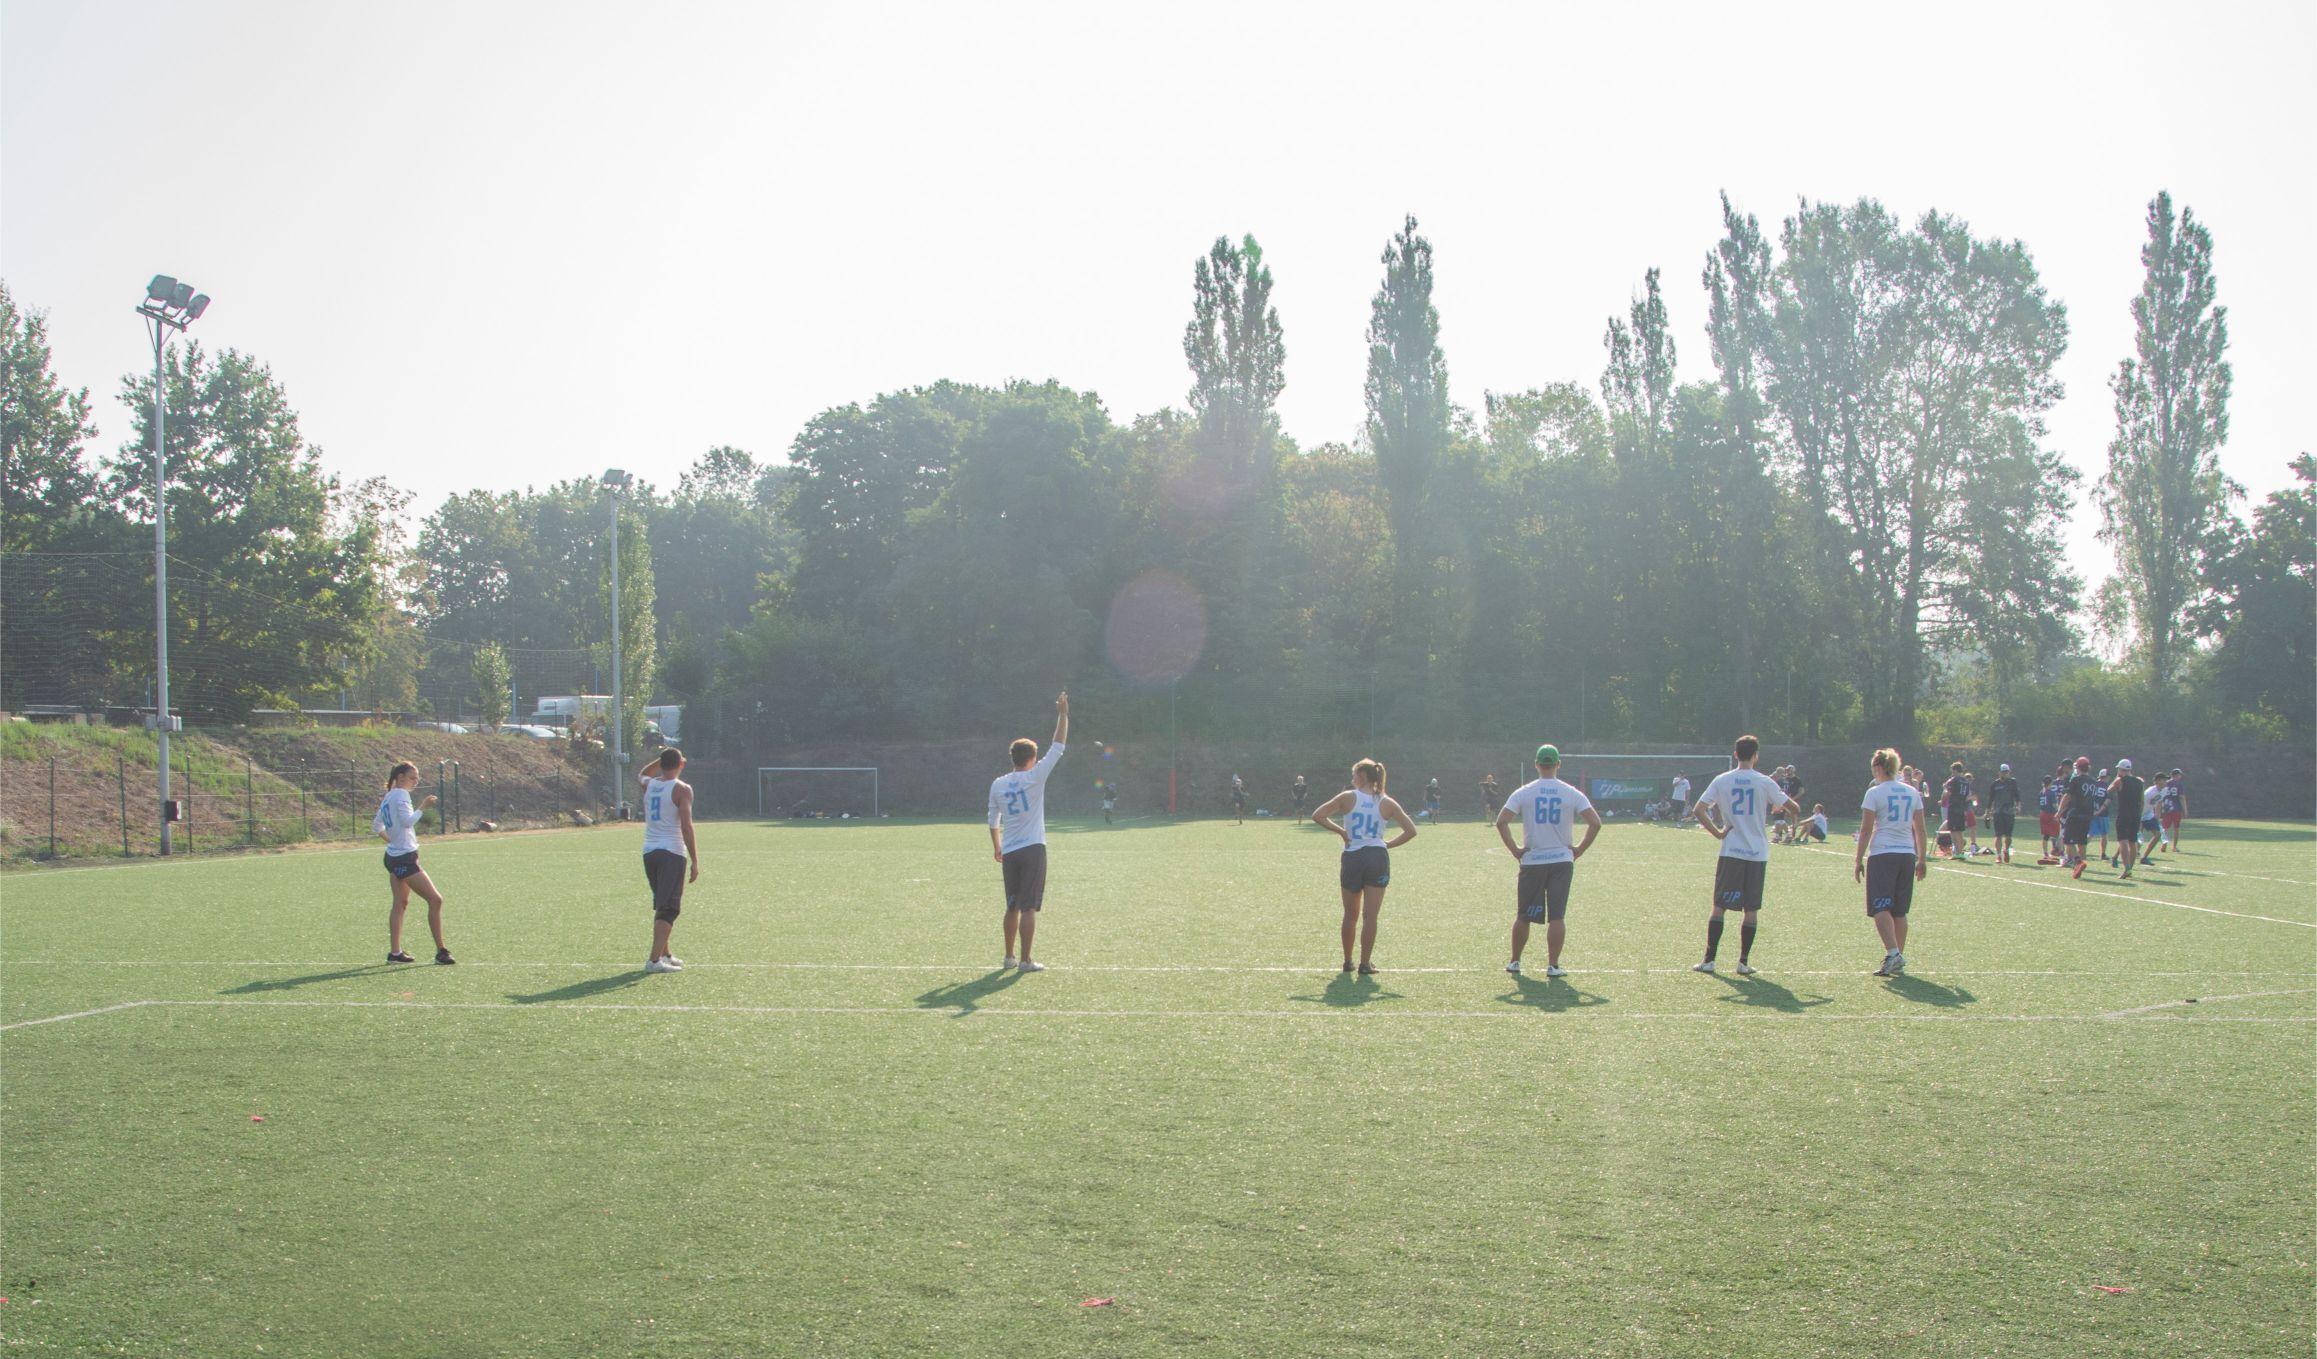 Mecz ultimate - 7 osób na linii